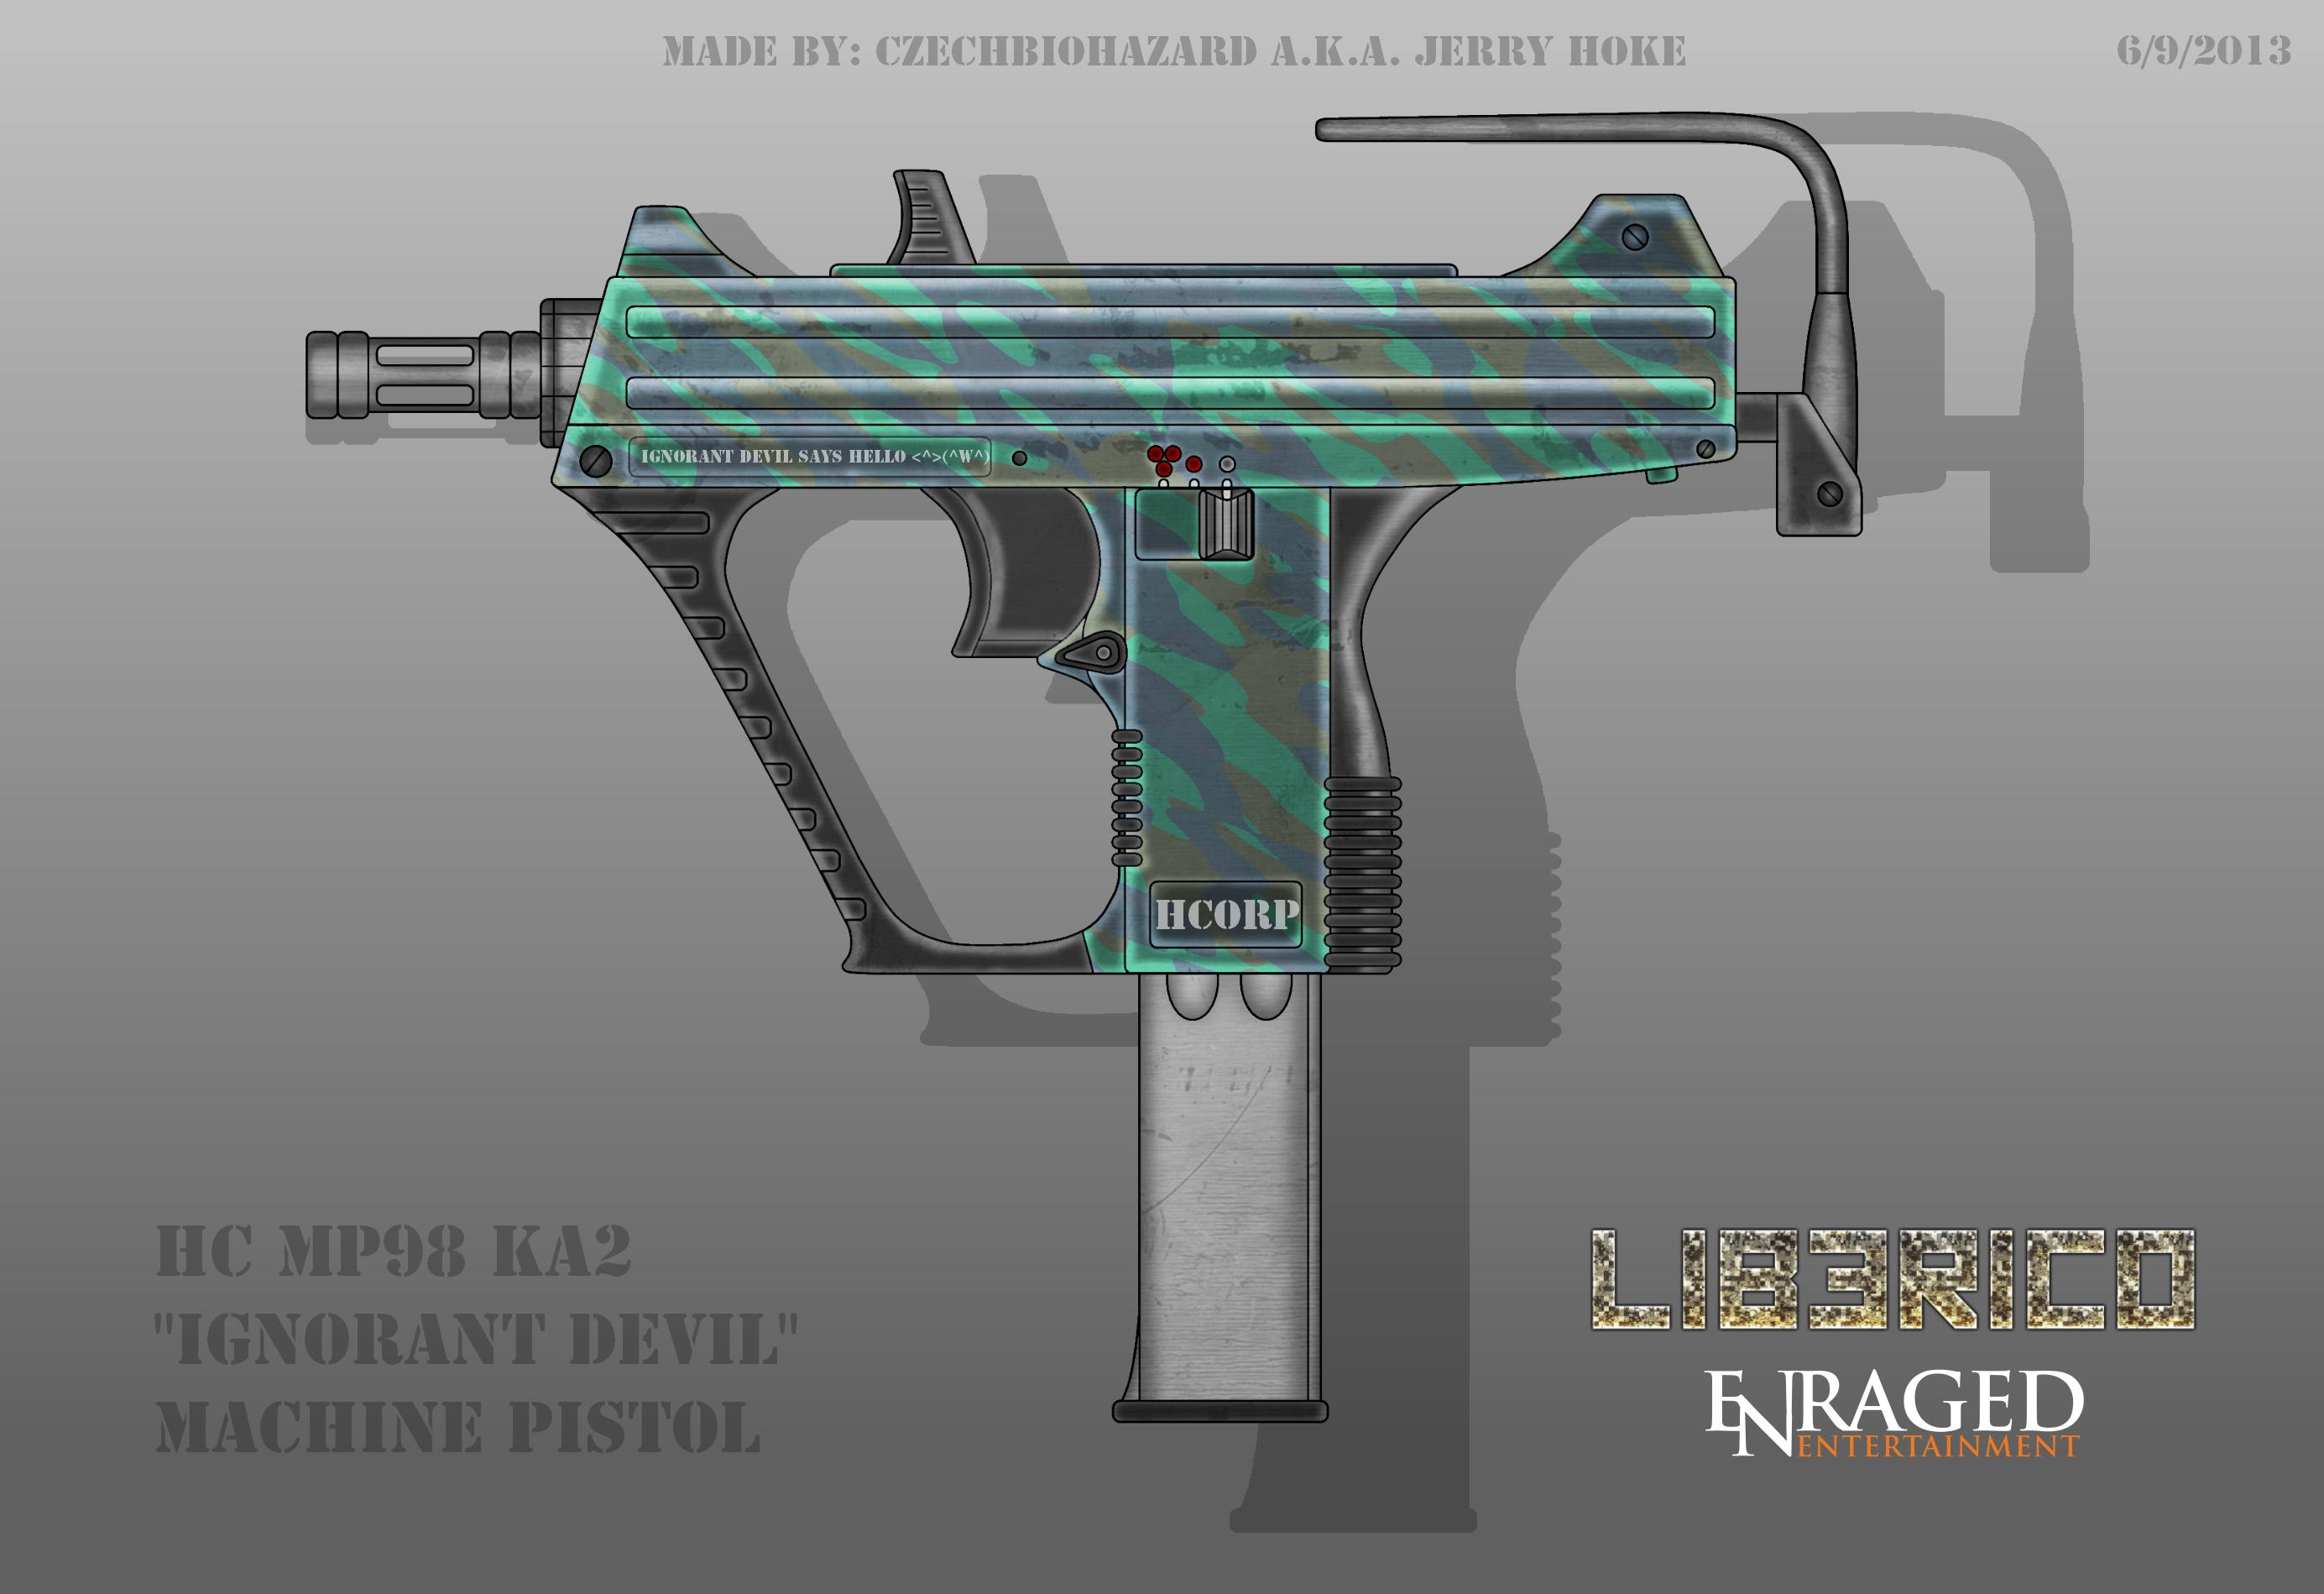 Fictional Firearm: HC-MP98KA2 Machine Pistol by CzechBiohazard